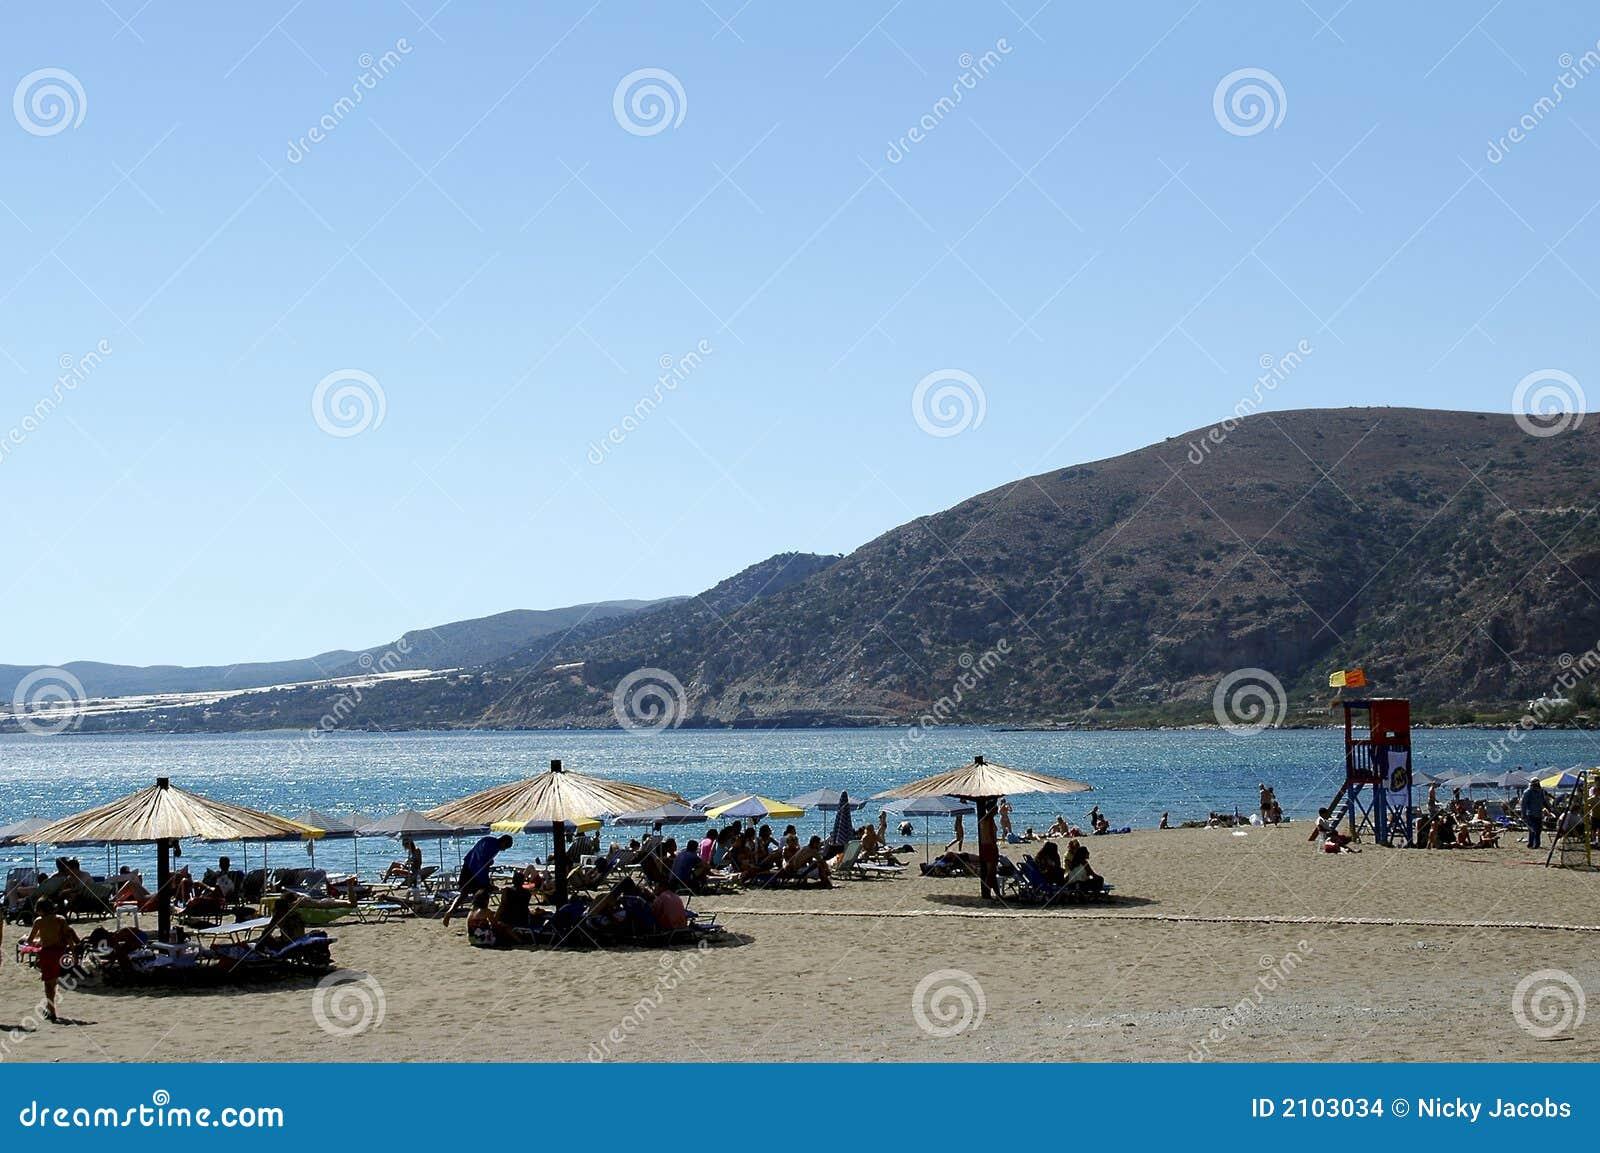 Crete Paleohora Beach Stock Images - Image: 2103034